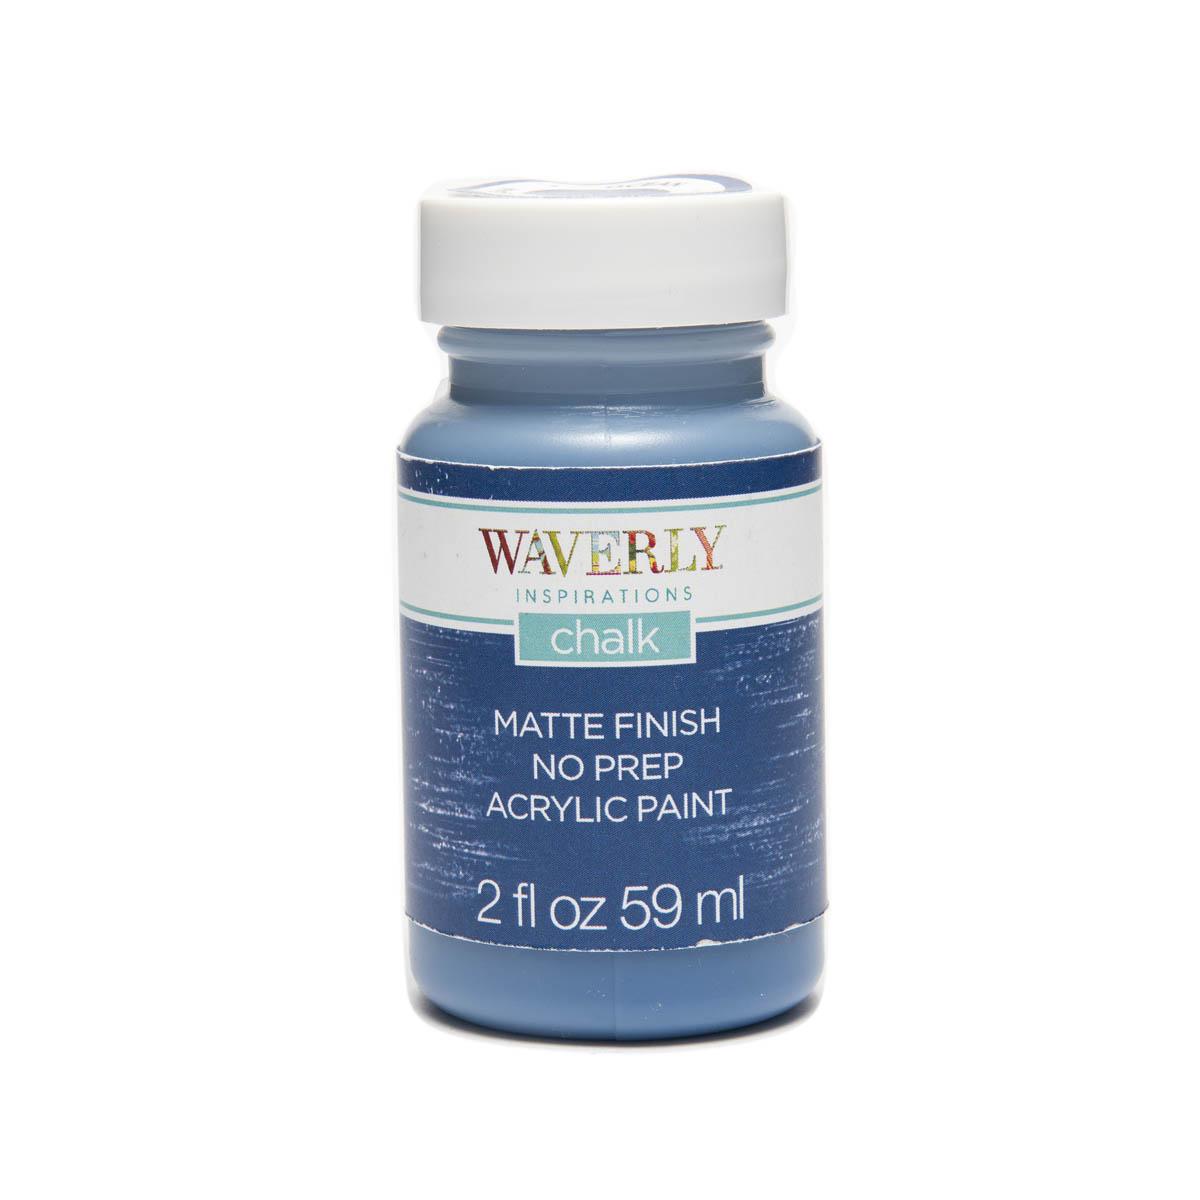 Waverly ® Inspirations Chalk Finish Acrylic Paint - Ocean, 2 oz.